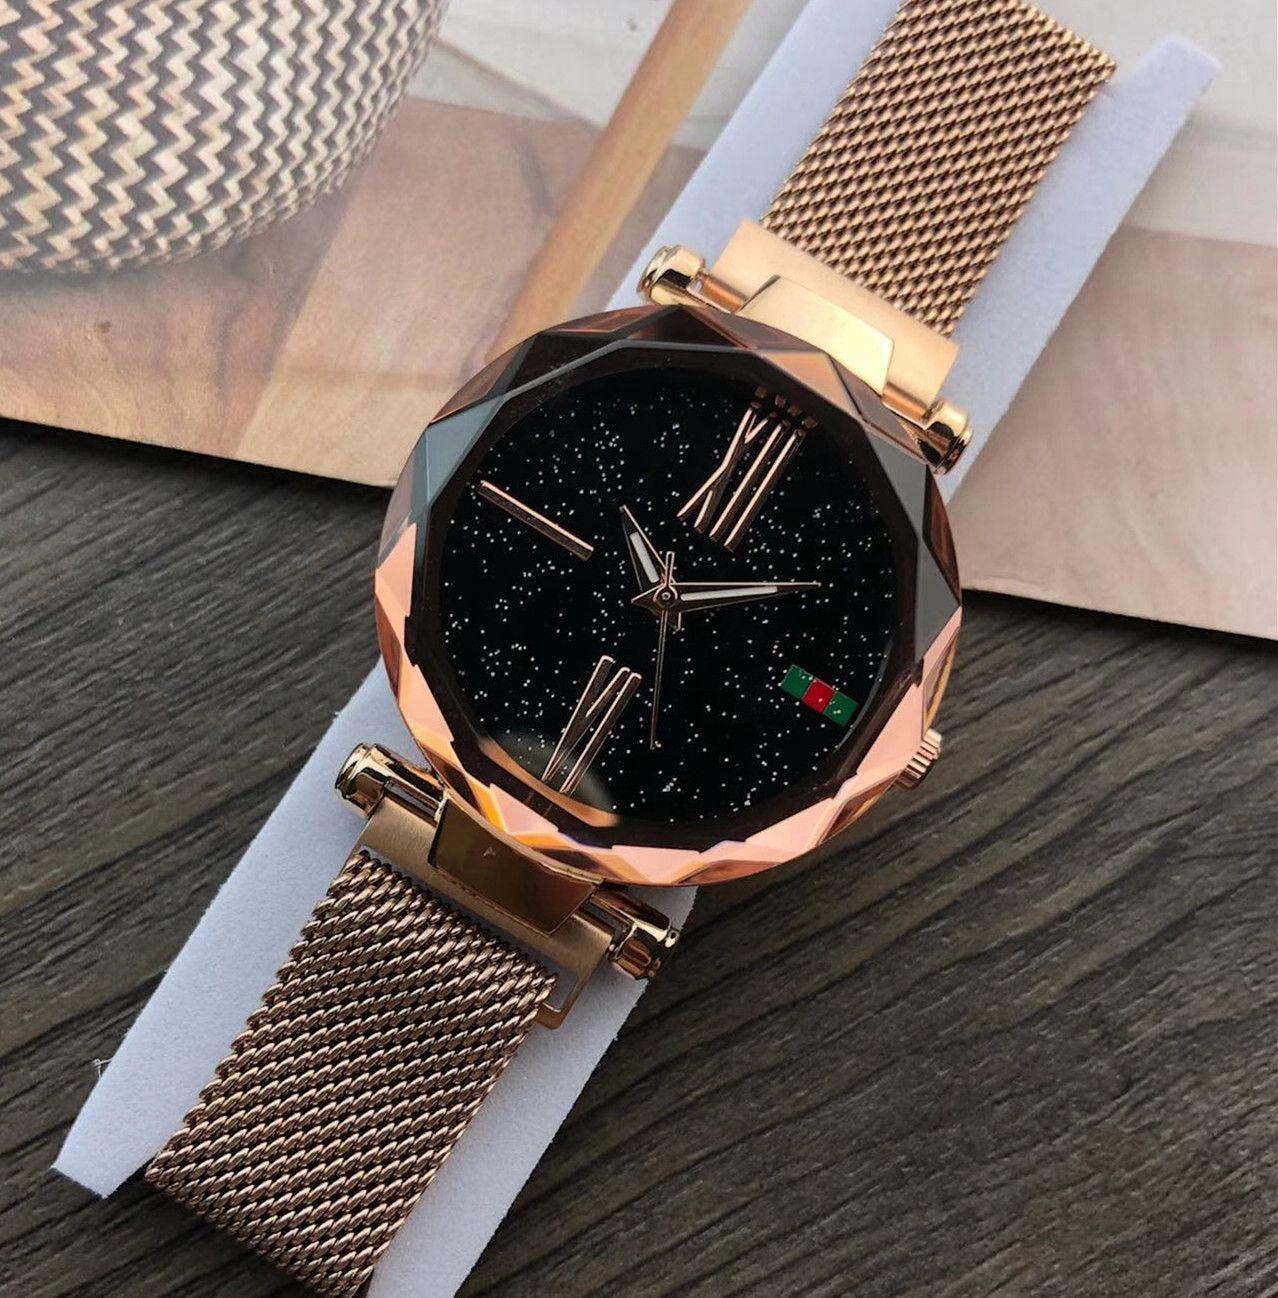 6c627903bc51 AAA Watch Women Luxury Brand Watch Waterproof Quartz Clock Dress ...